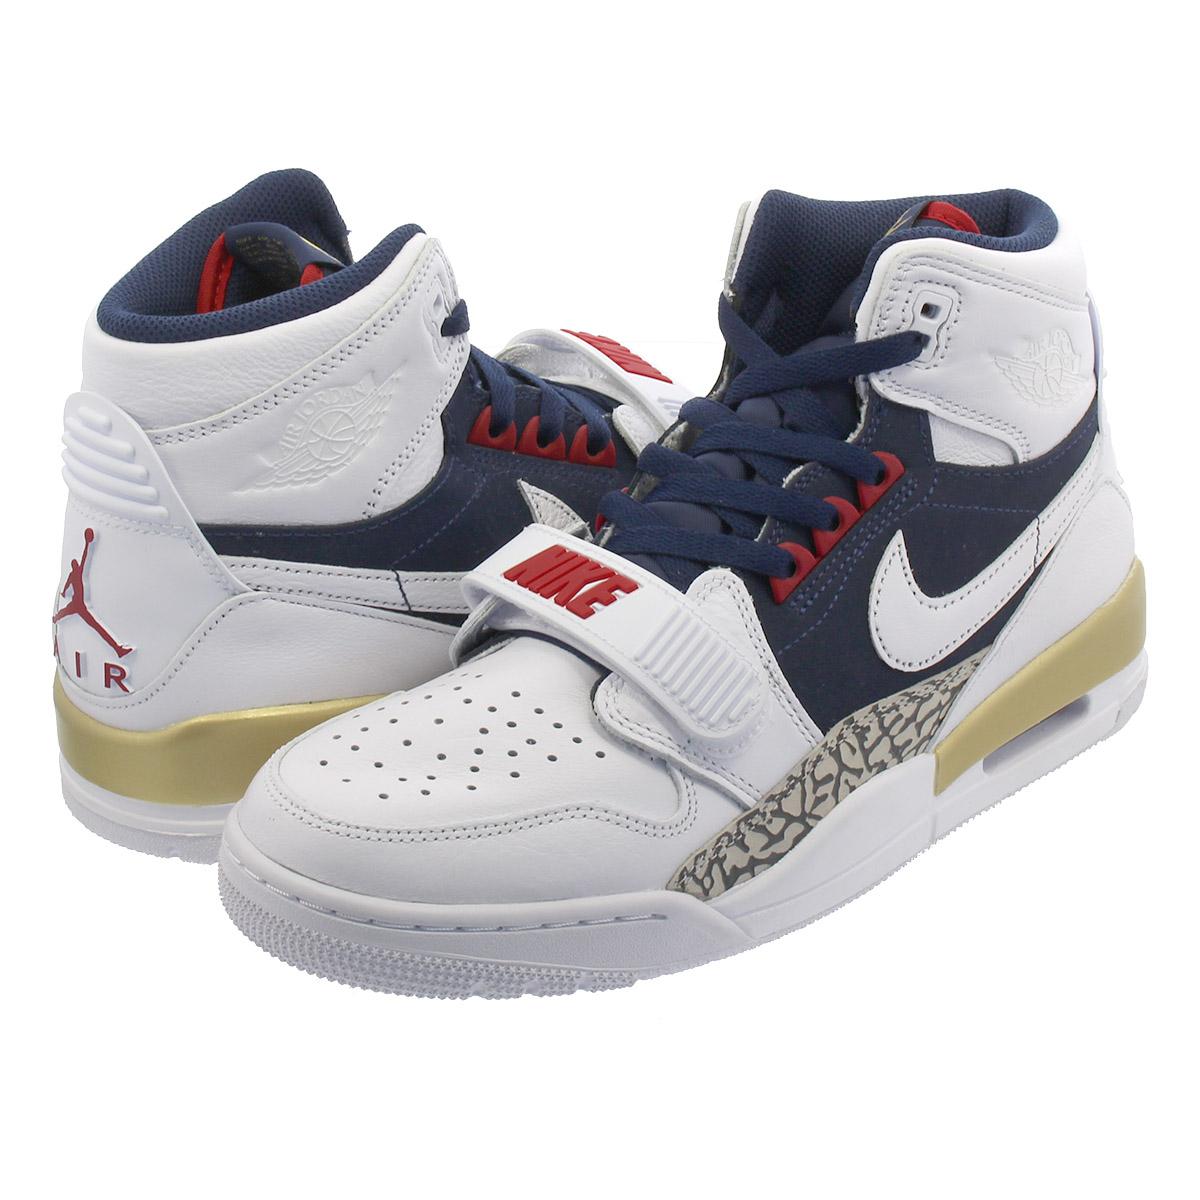 06a422e7b242 NIKE AIR JORDAN LEGACY 312 Nike Air Jordan Legacy 312 WHITE MIDNIGHT  NAVY VARSITY RED av3922-101